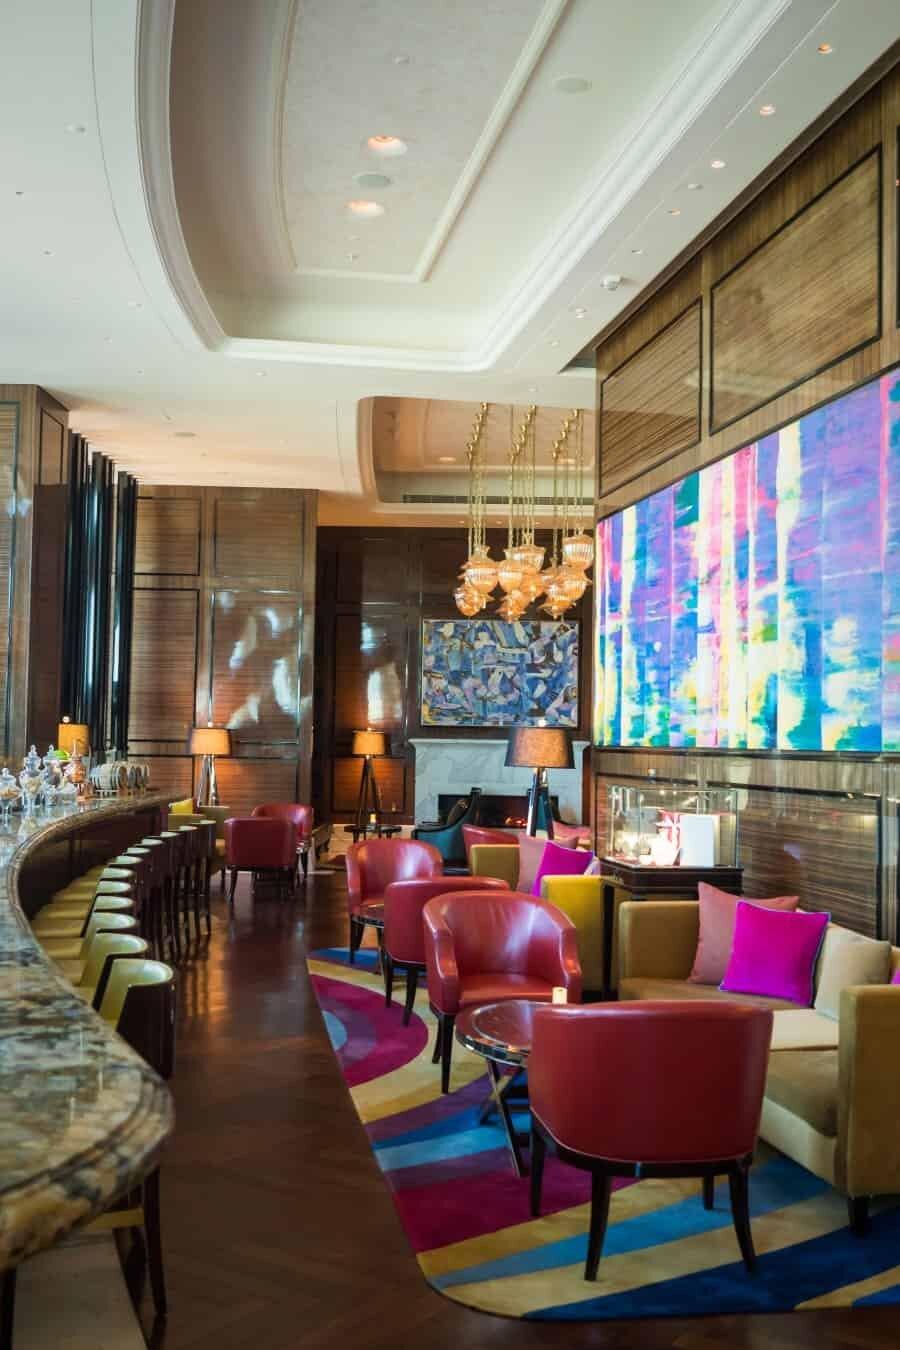 Ritz Carlton Macao - Macao photography locations